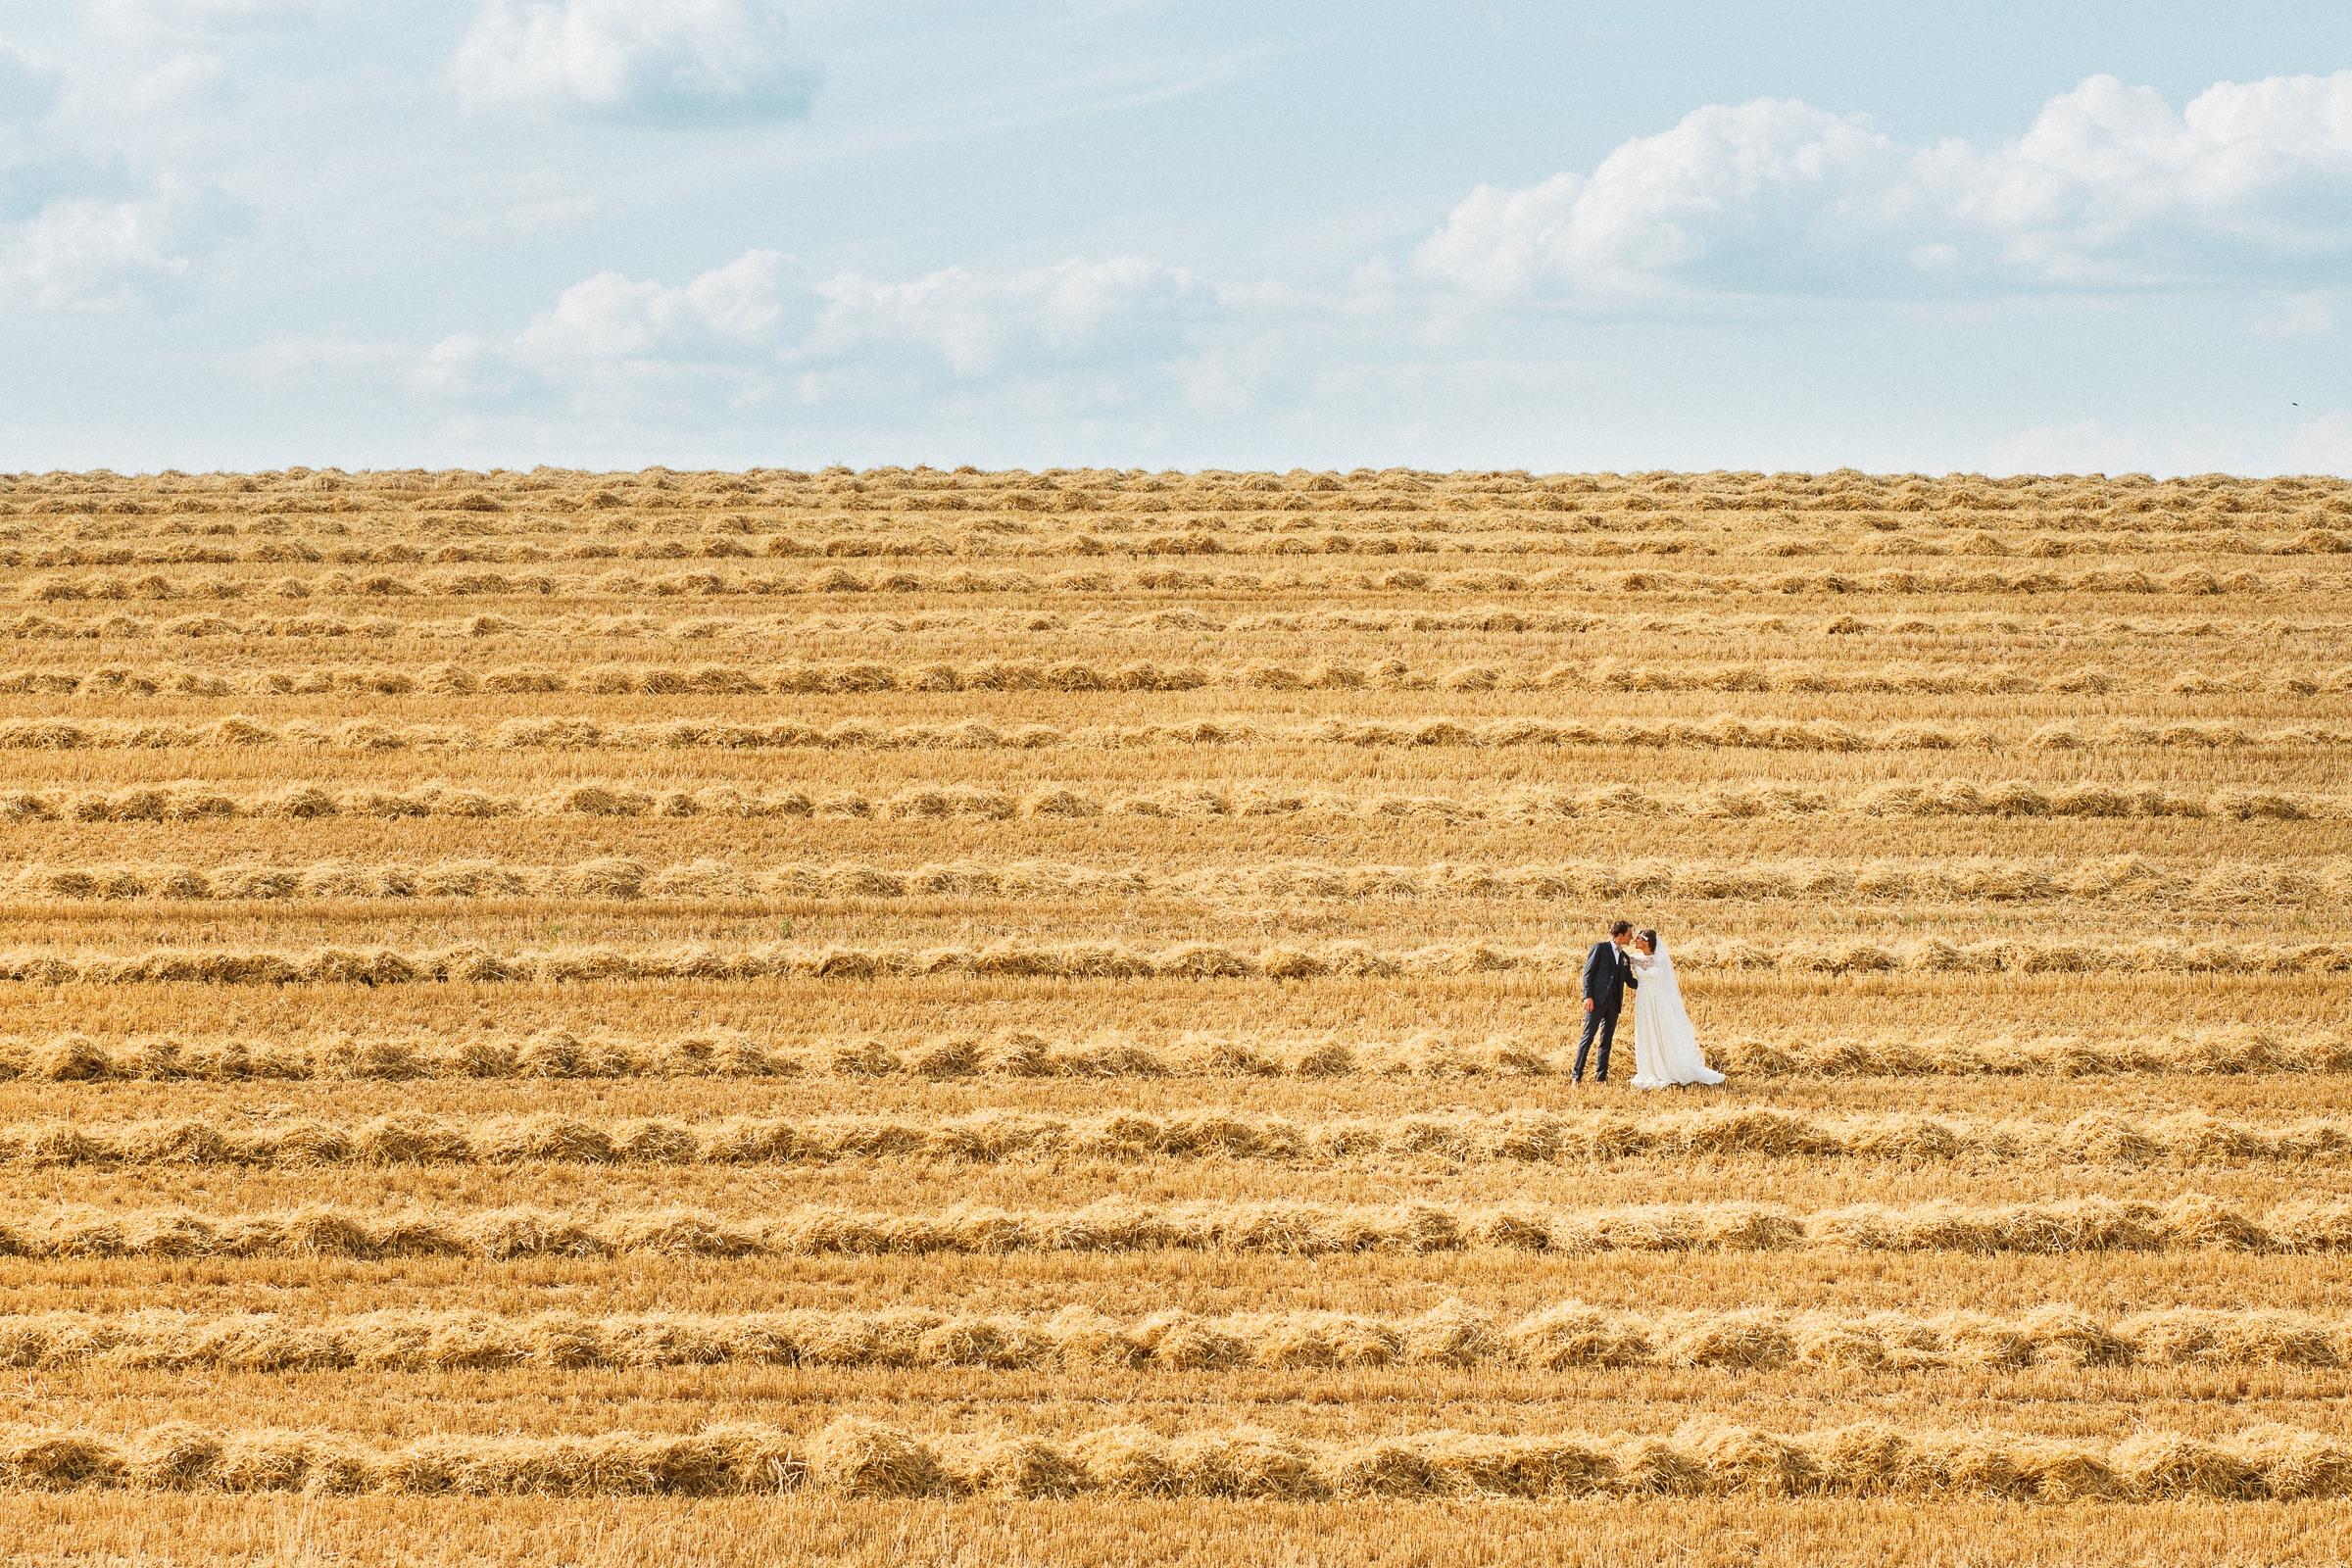 landscape-couple-in-hay-field-sylvain-bouzat-wedding-photographer